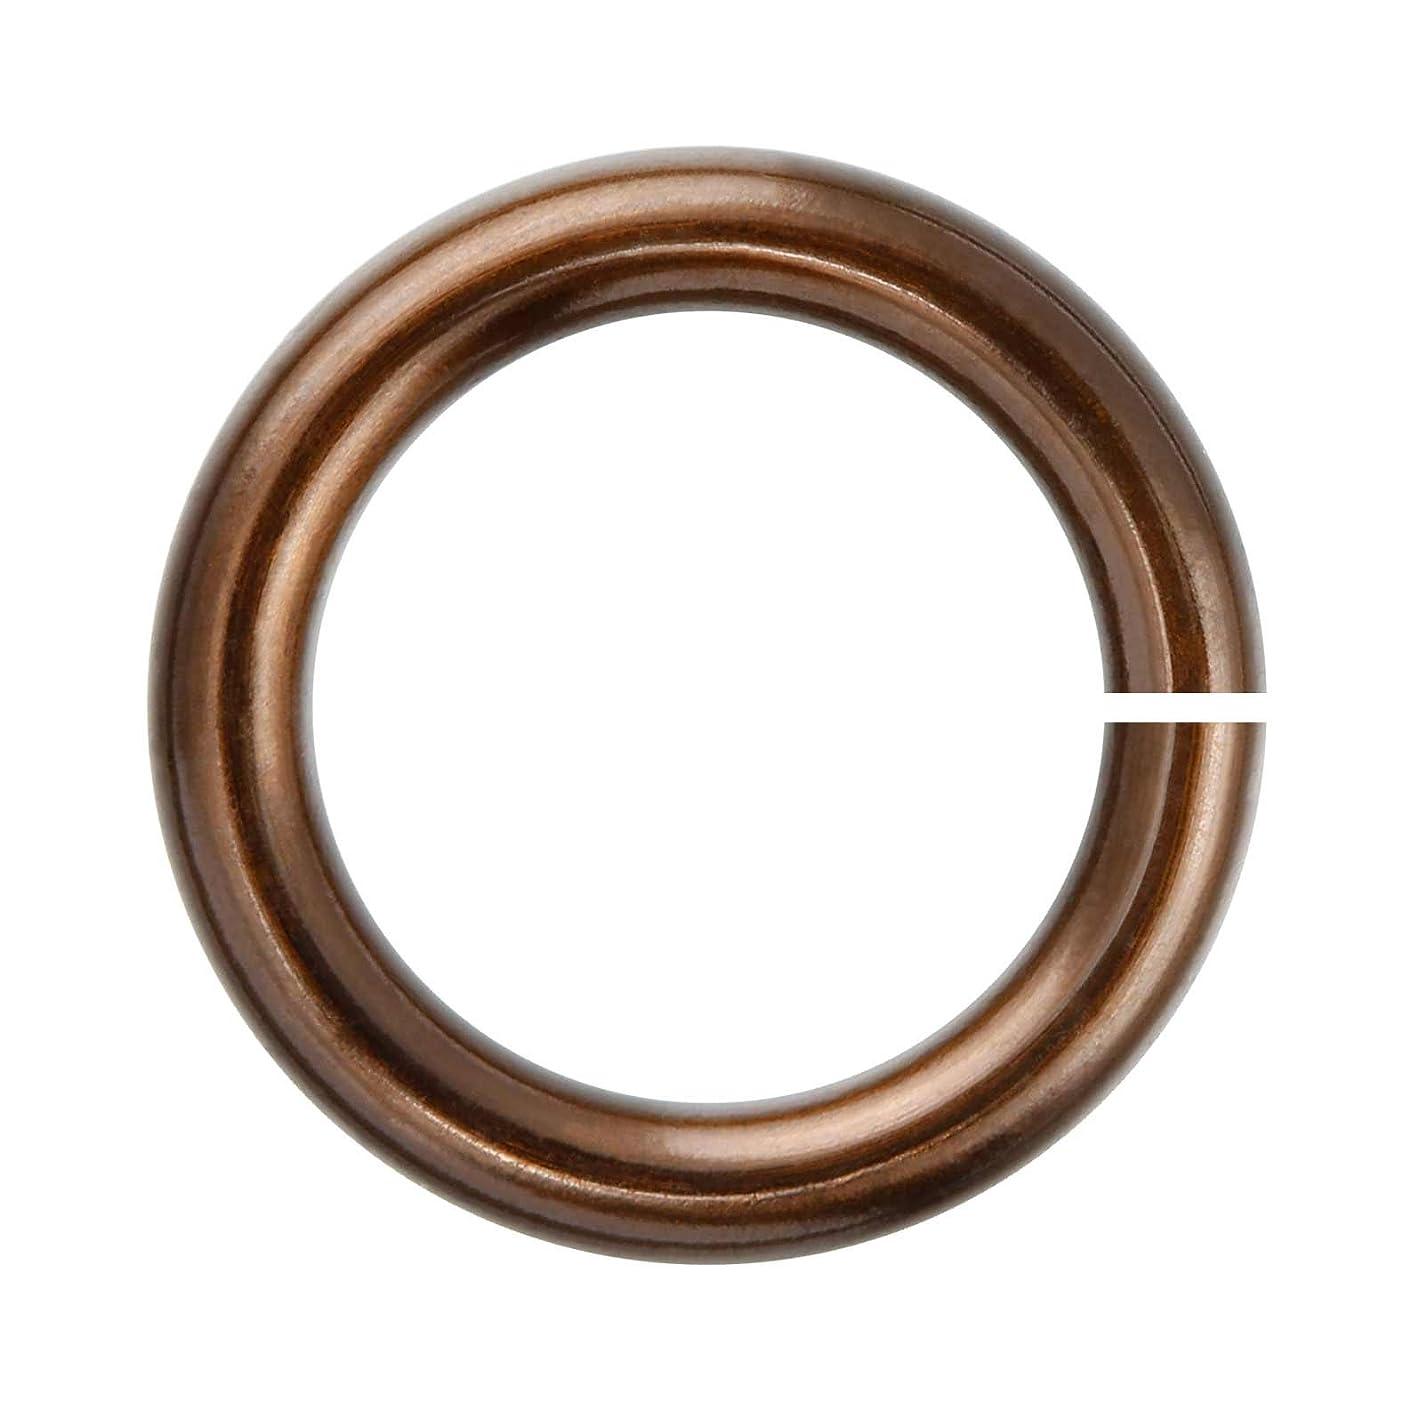 18-Gauge 3mm Smokey Quartz Enameled Copper Jump Rings - 1 ounce